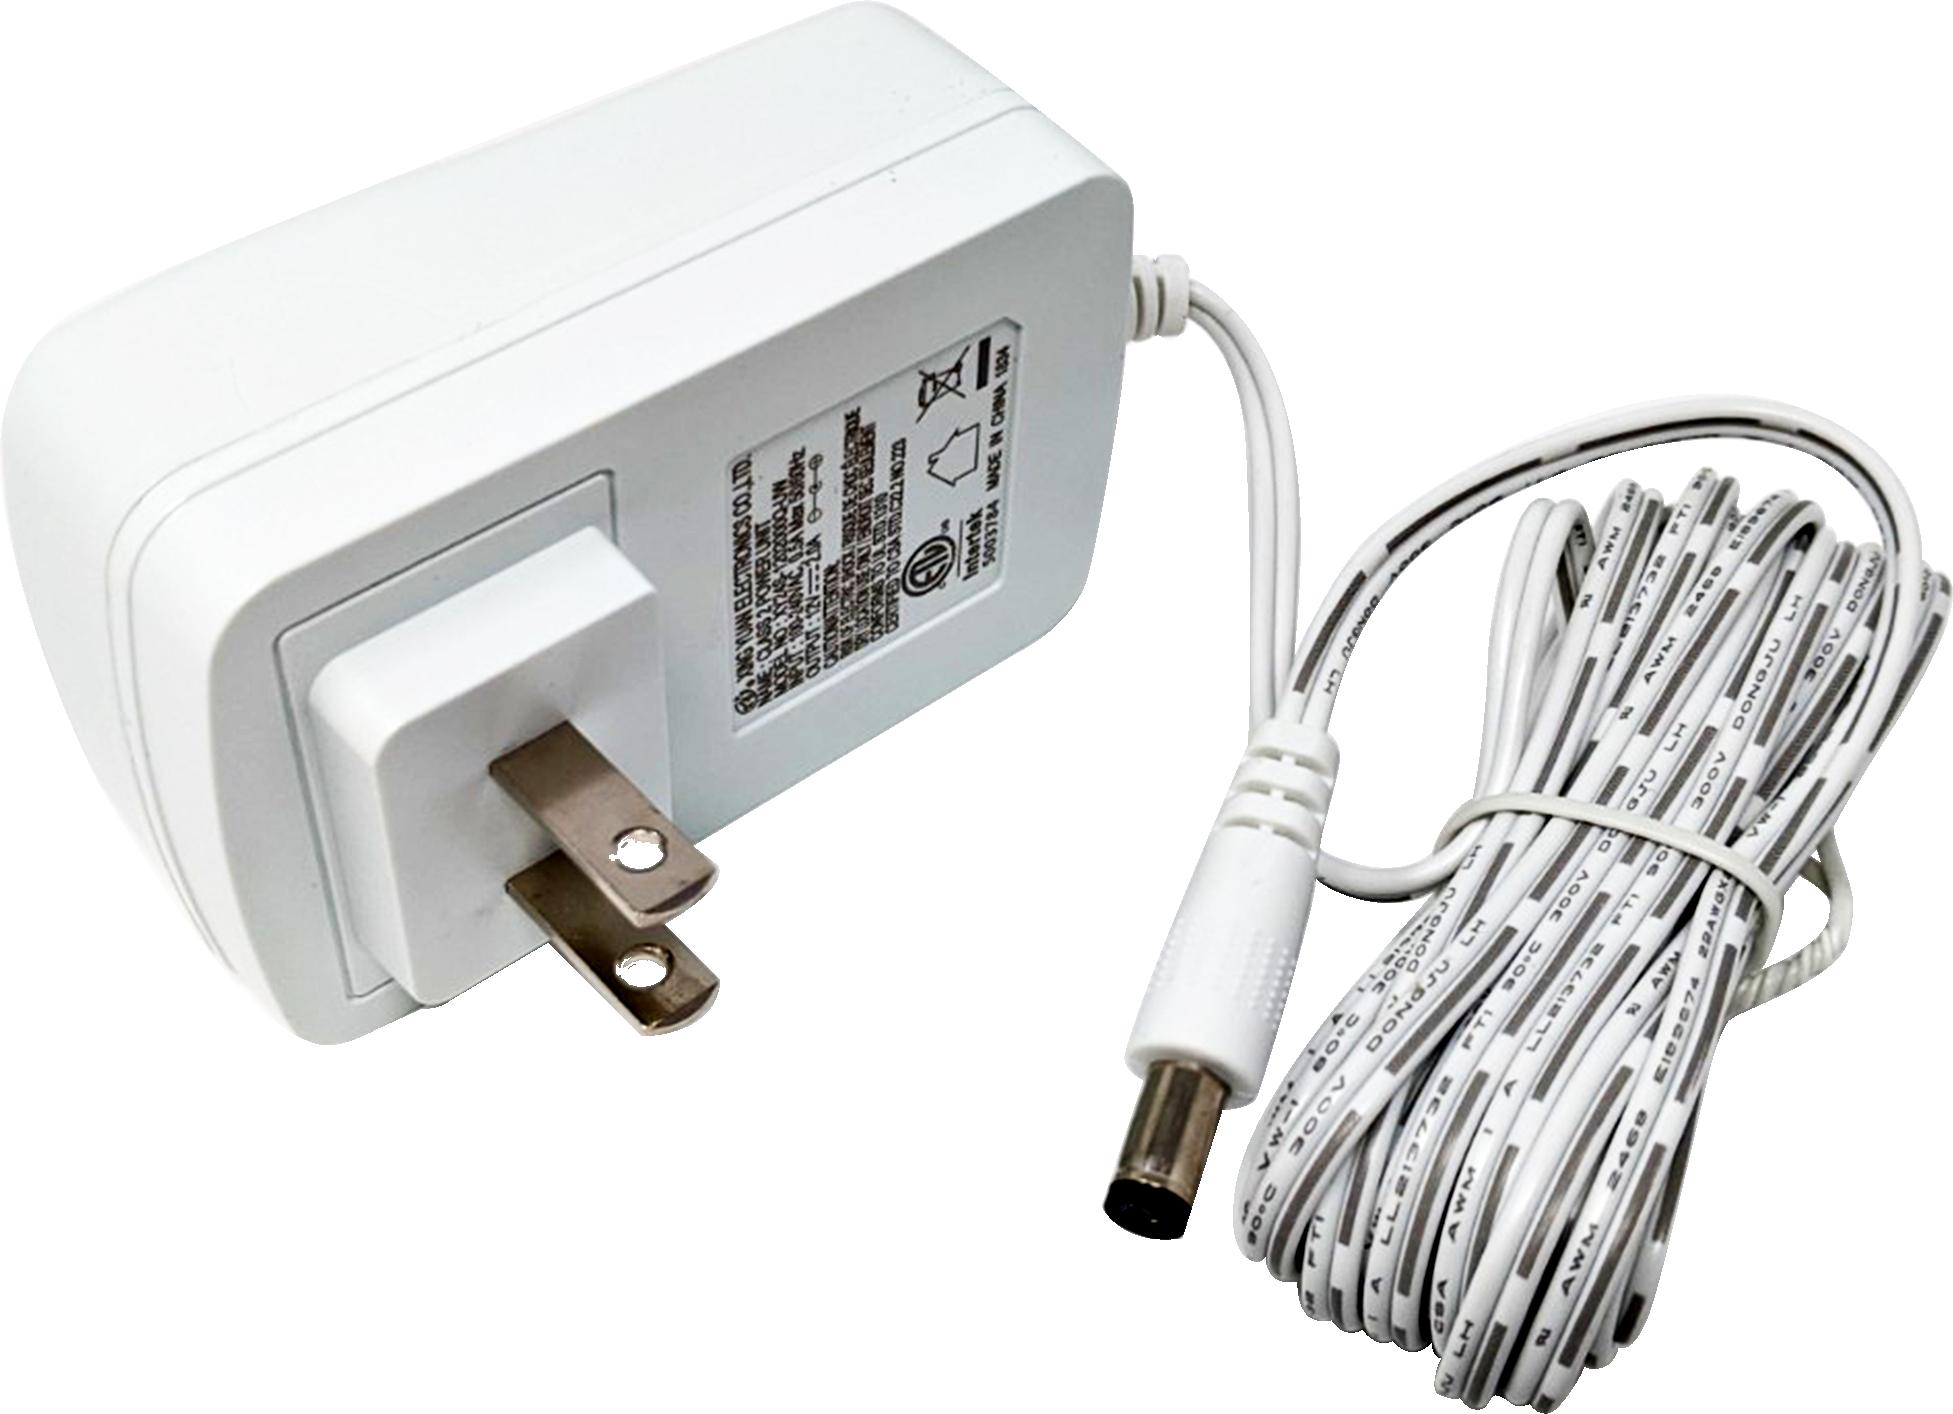 Original Model Power Supply